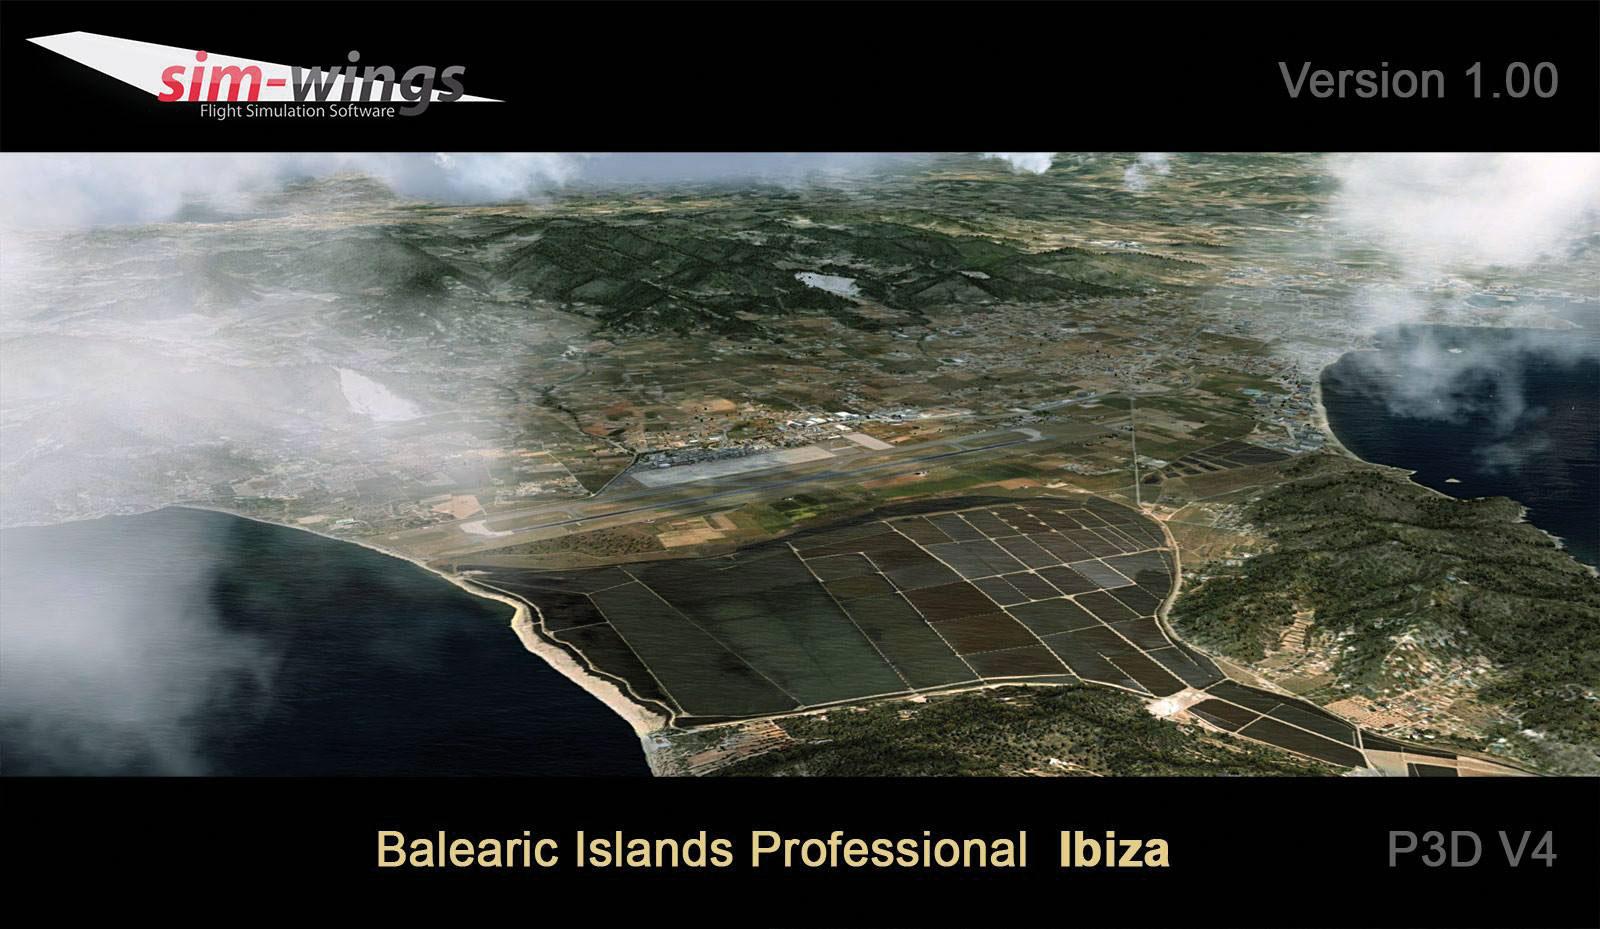 Ibiza: Balearic Islands Professional Scenery for P3D